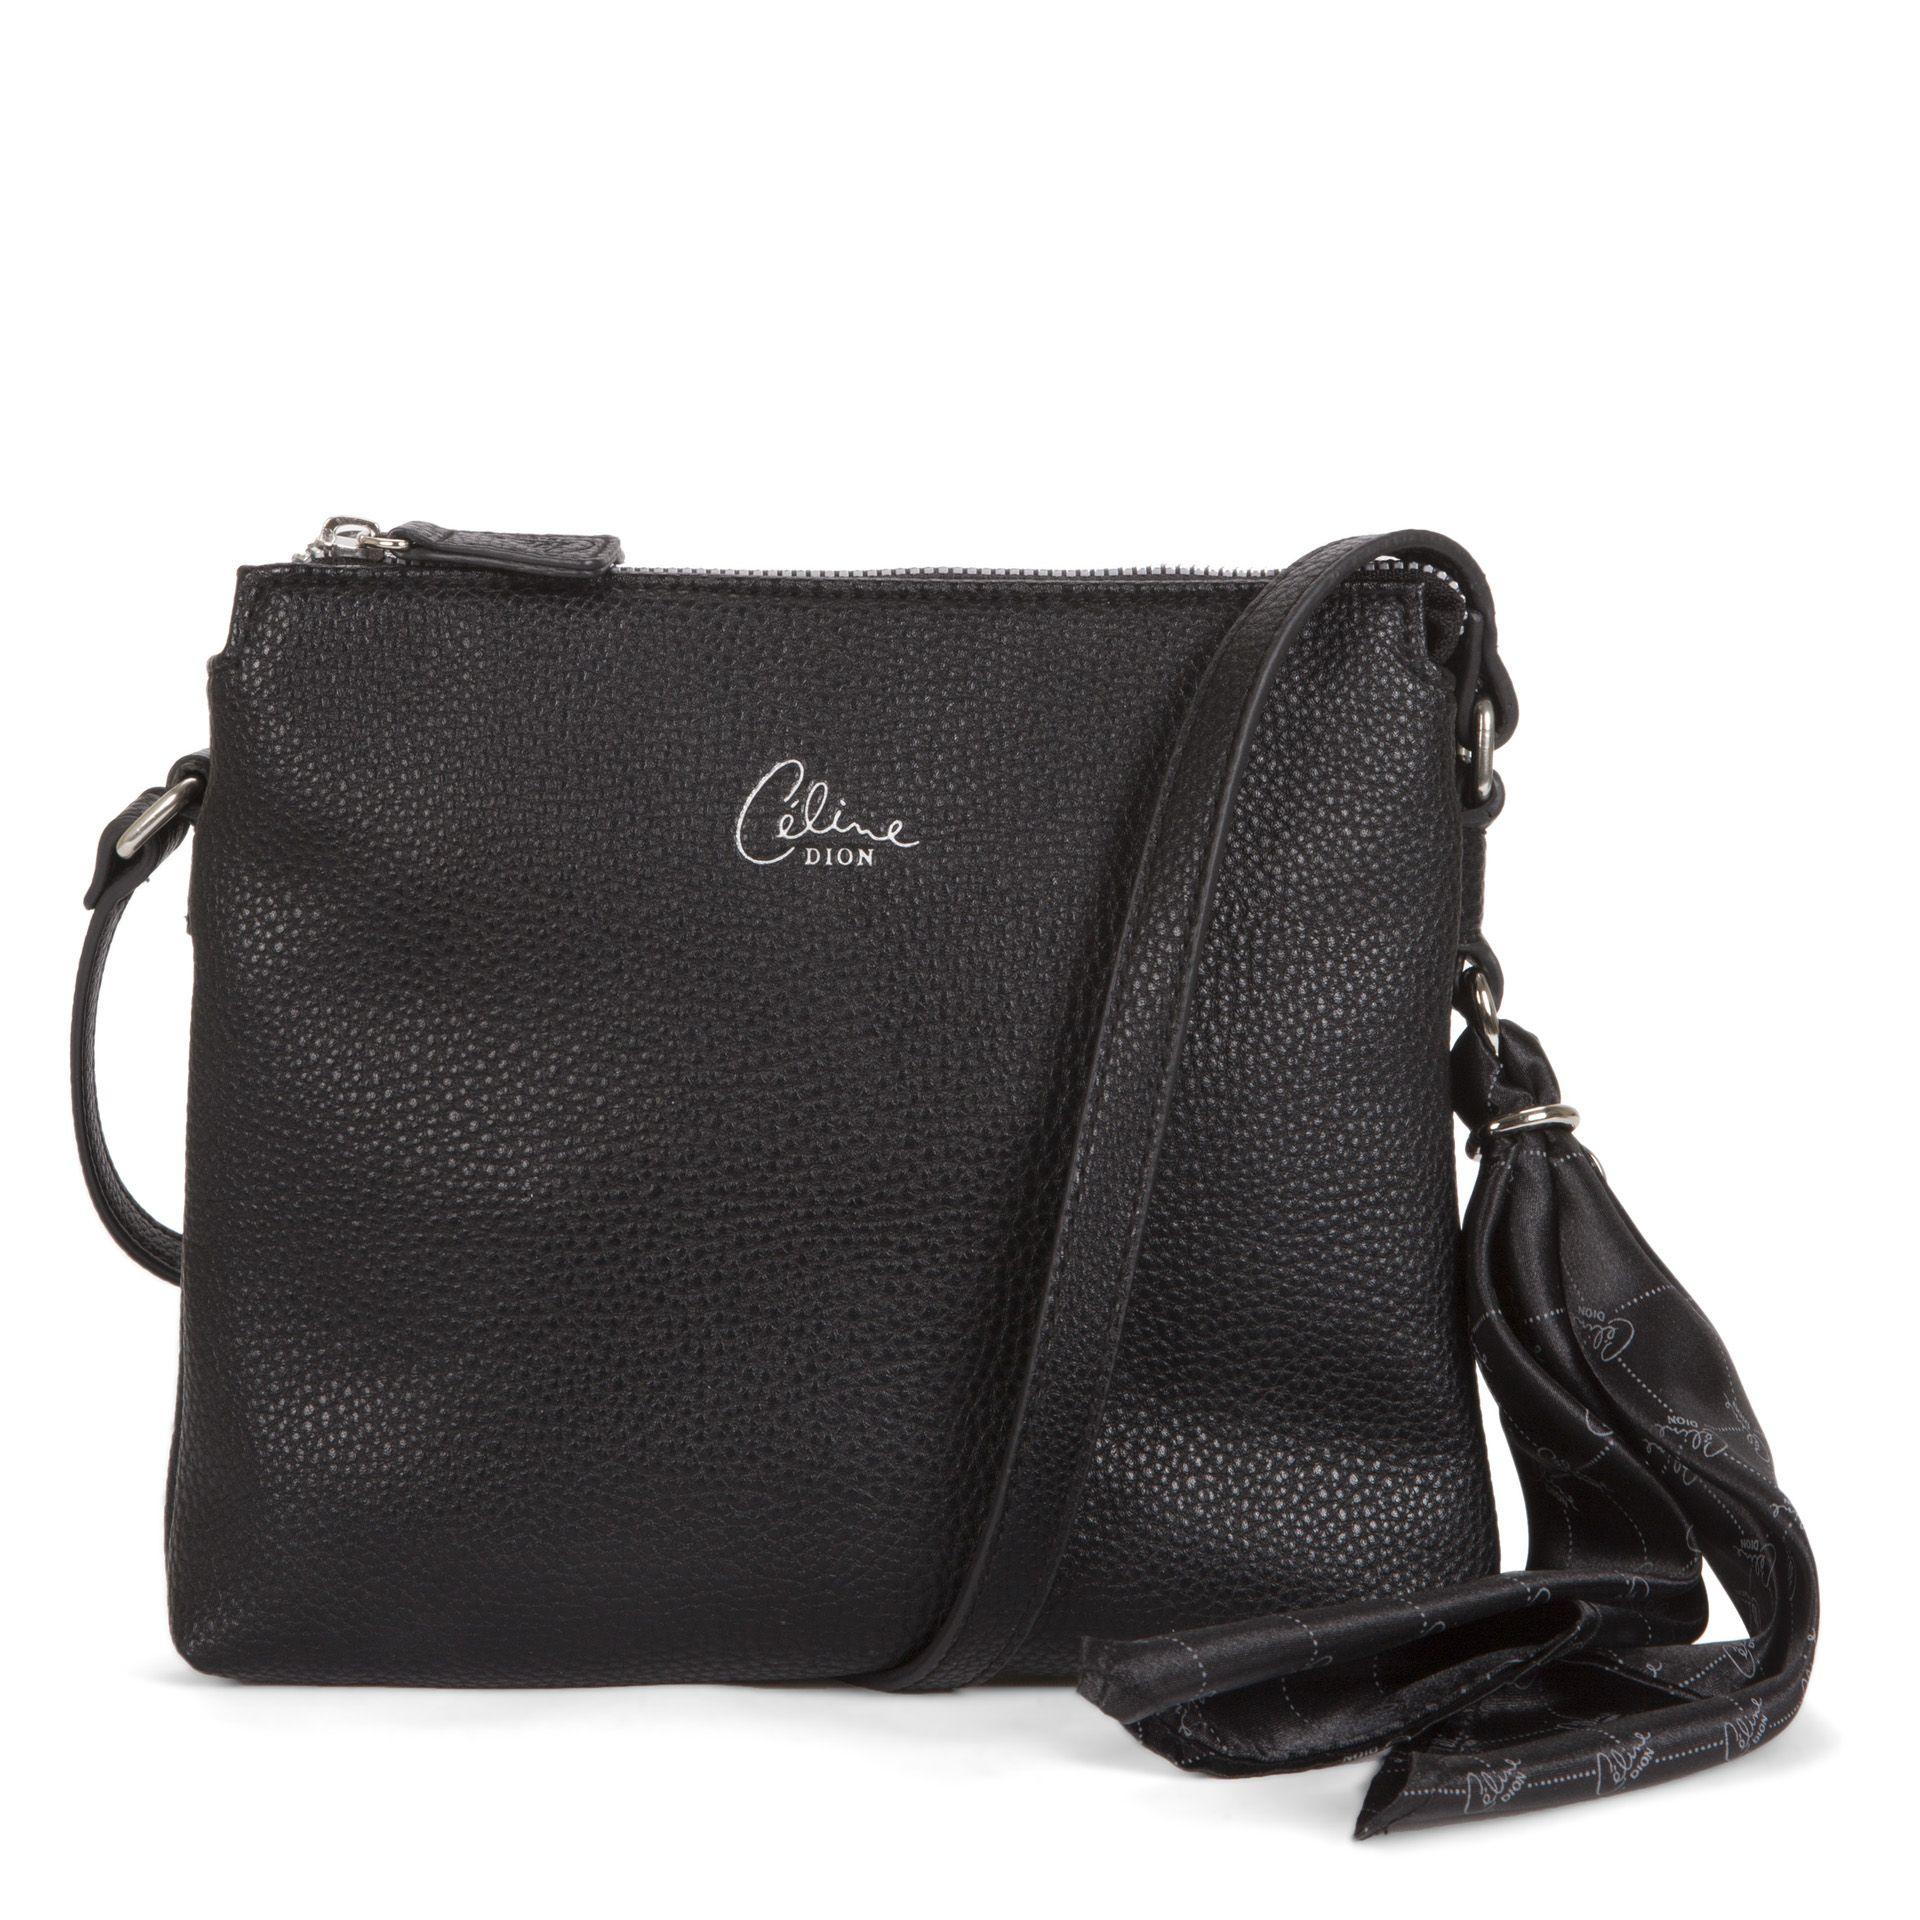 Bentley Celine Dion Bag